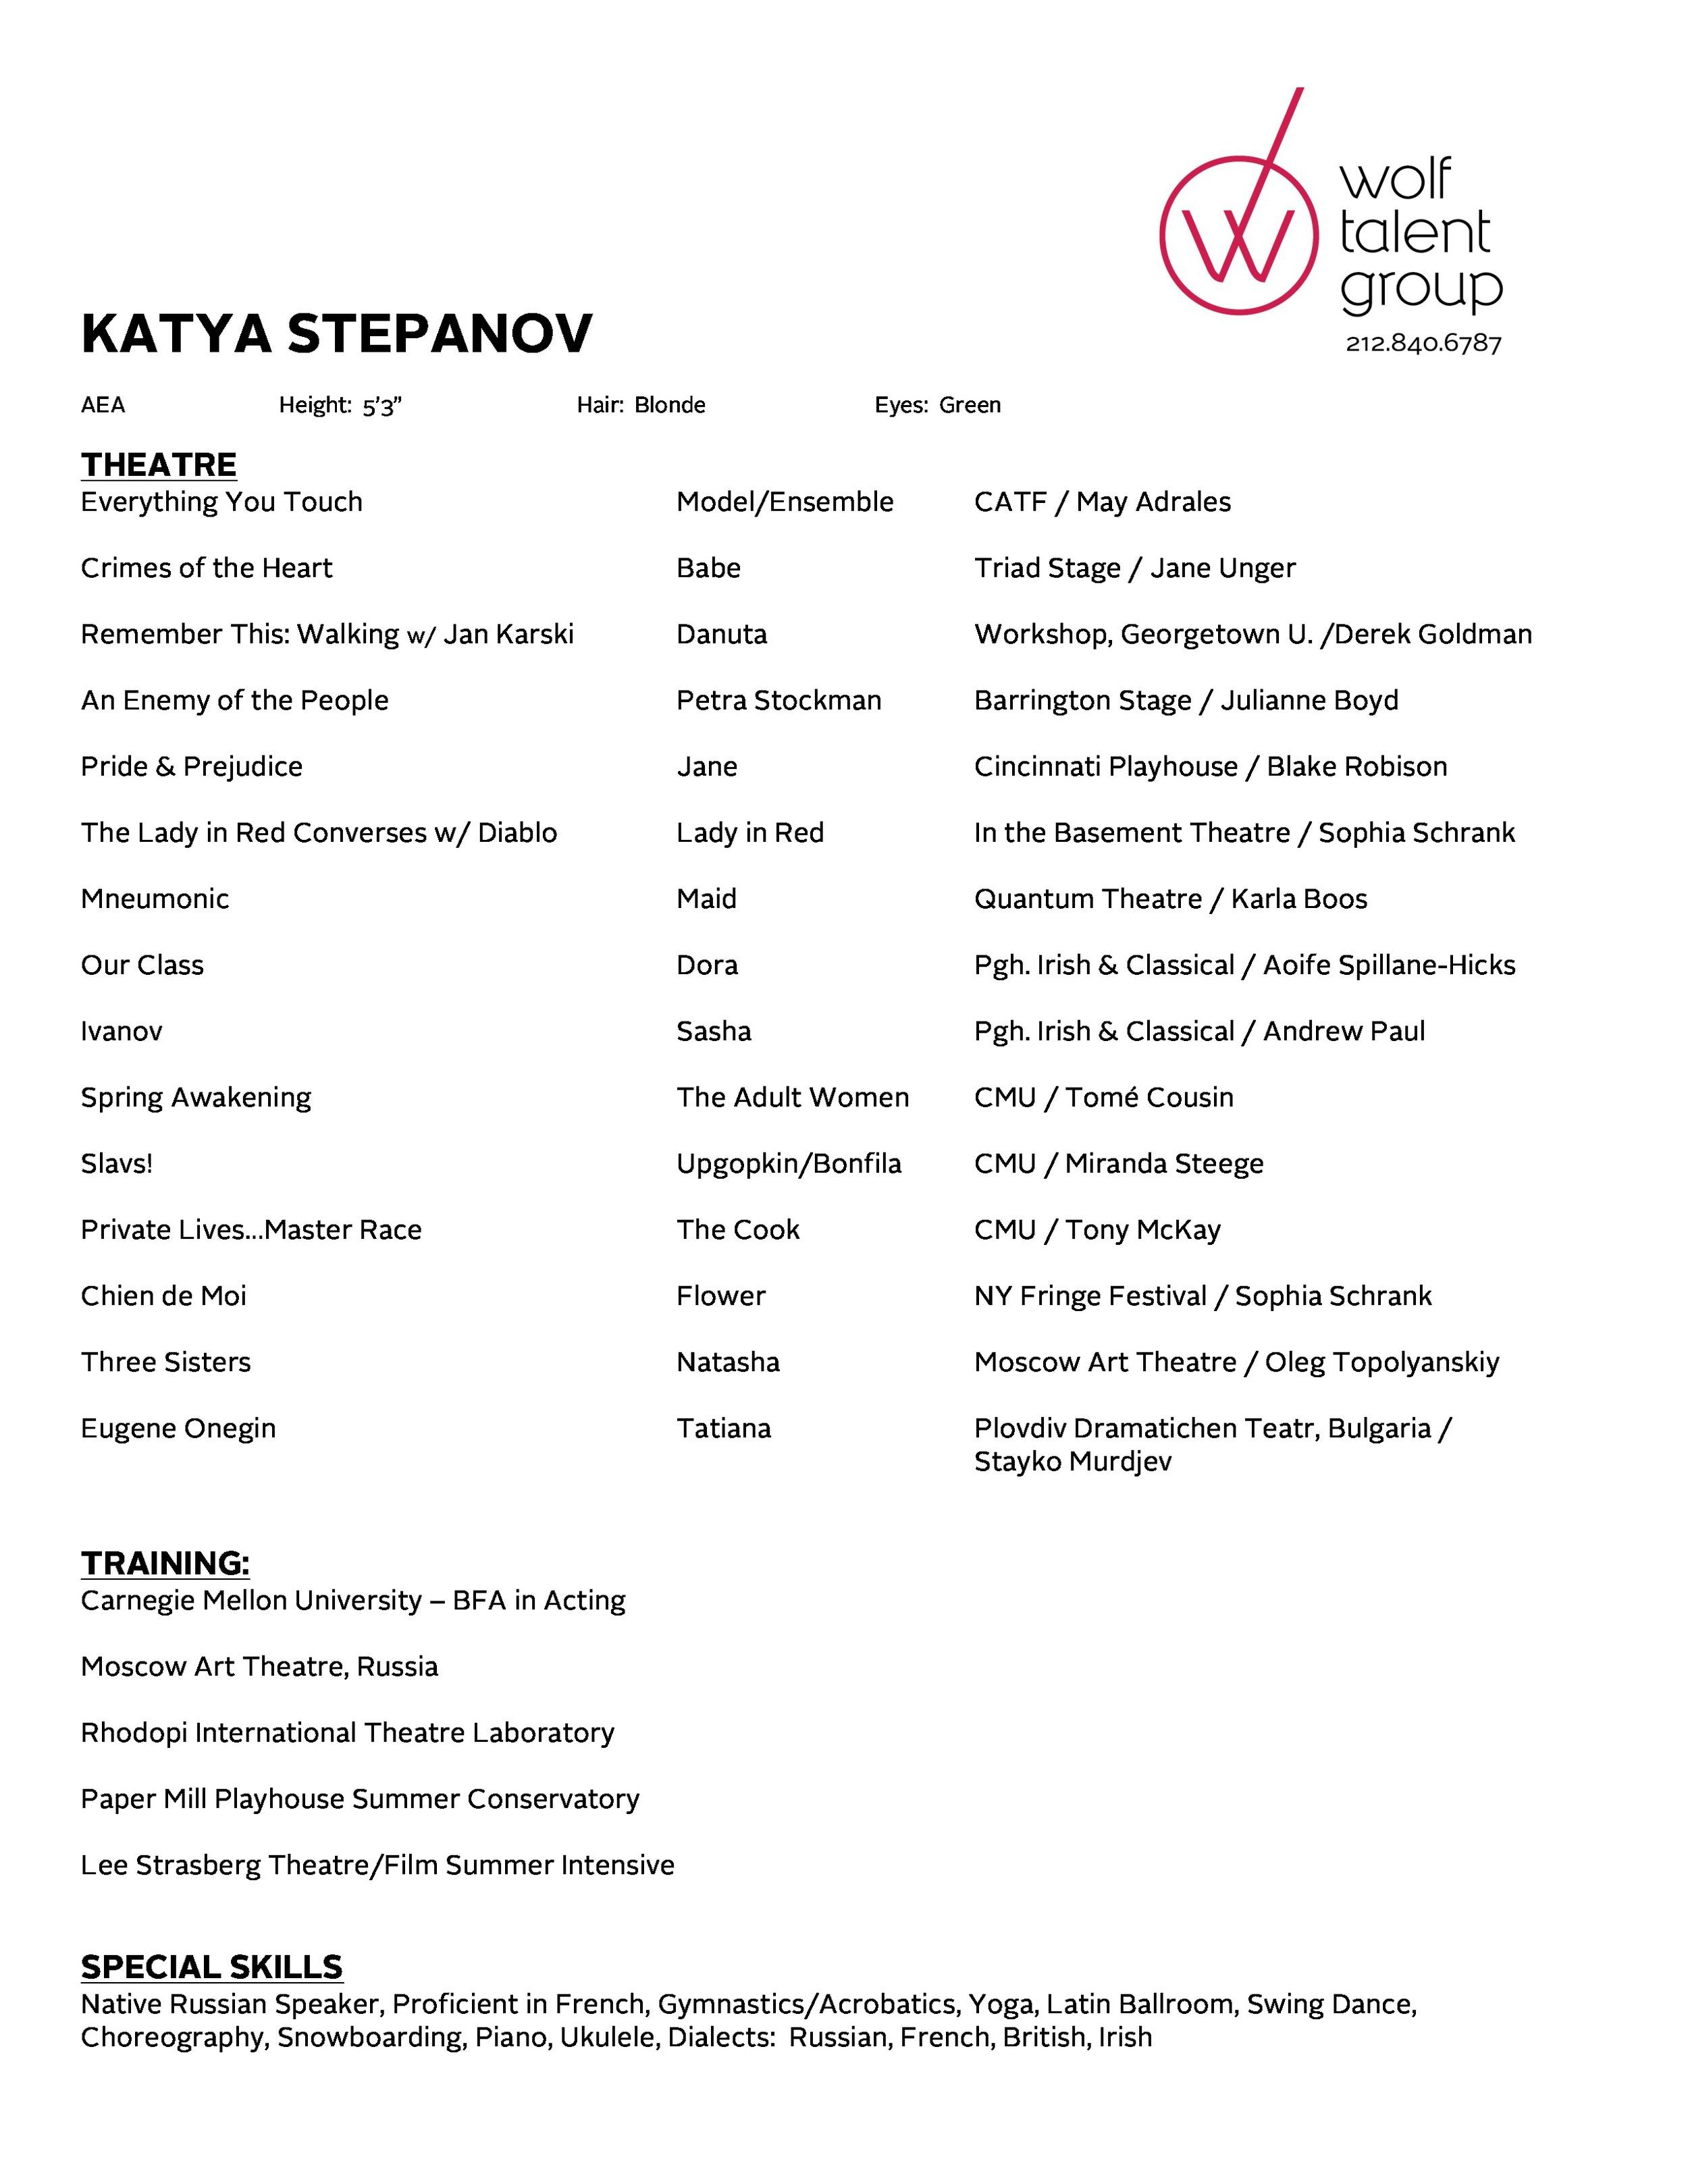 Katya Stepanov Resume-page-0.jpg